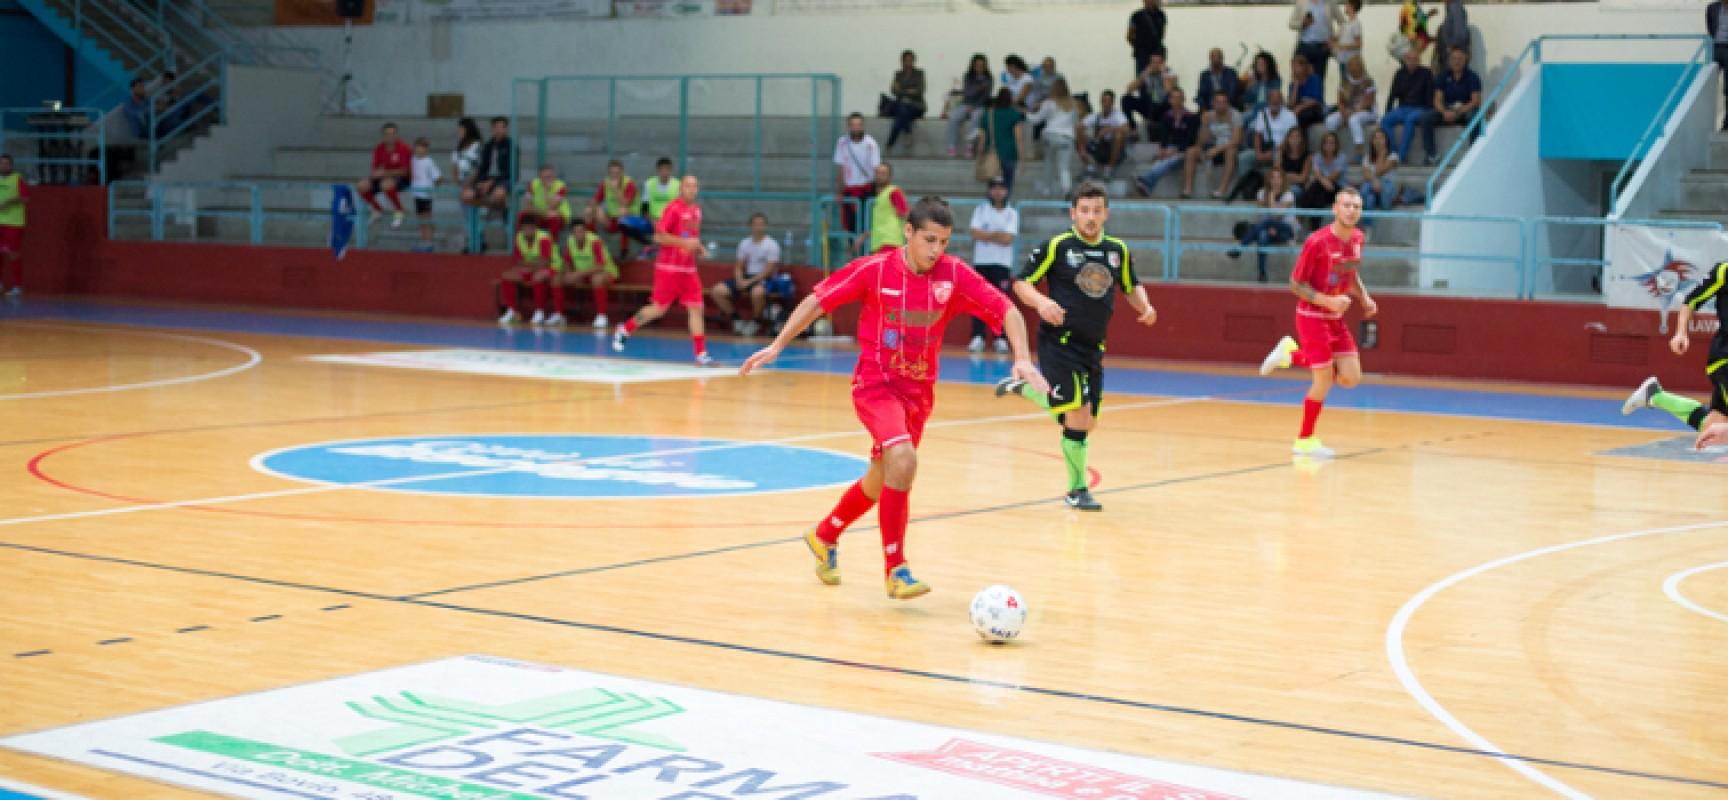 Diaz C5 sconfitta 1-3 in casa dal Futsal Canosa